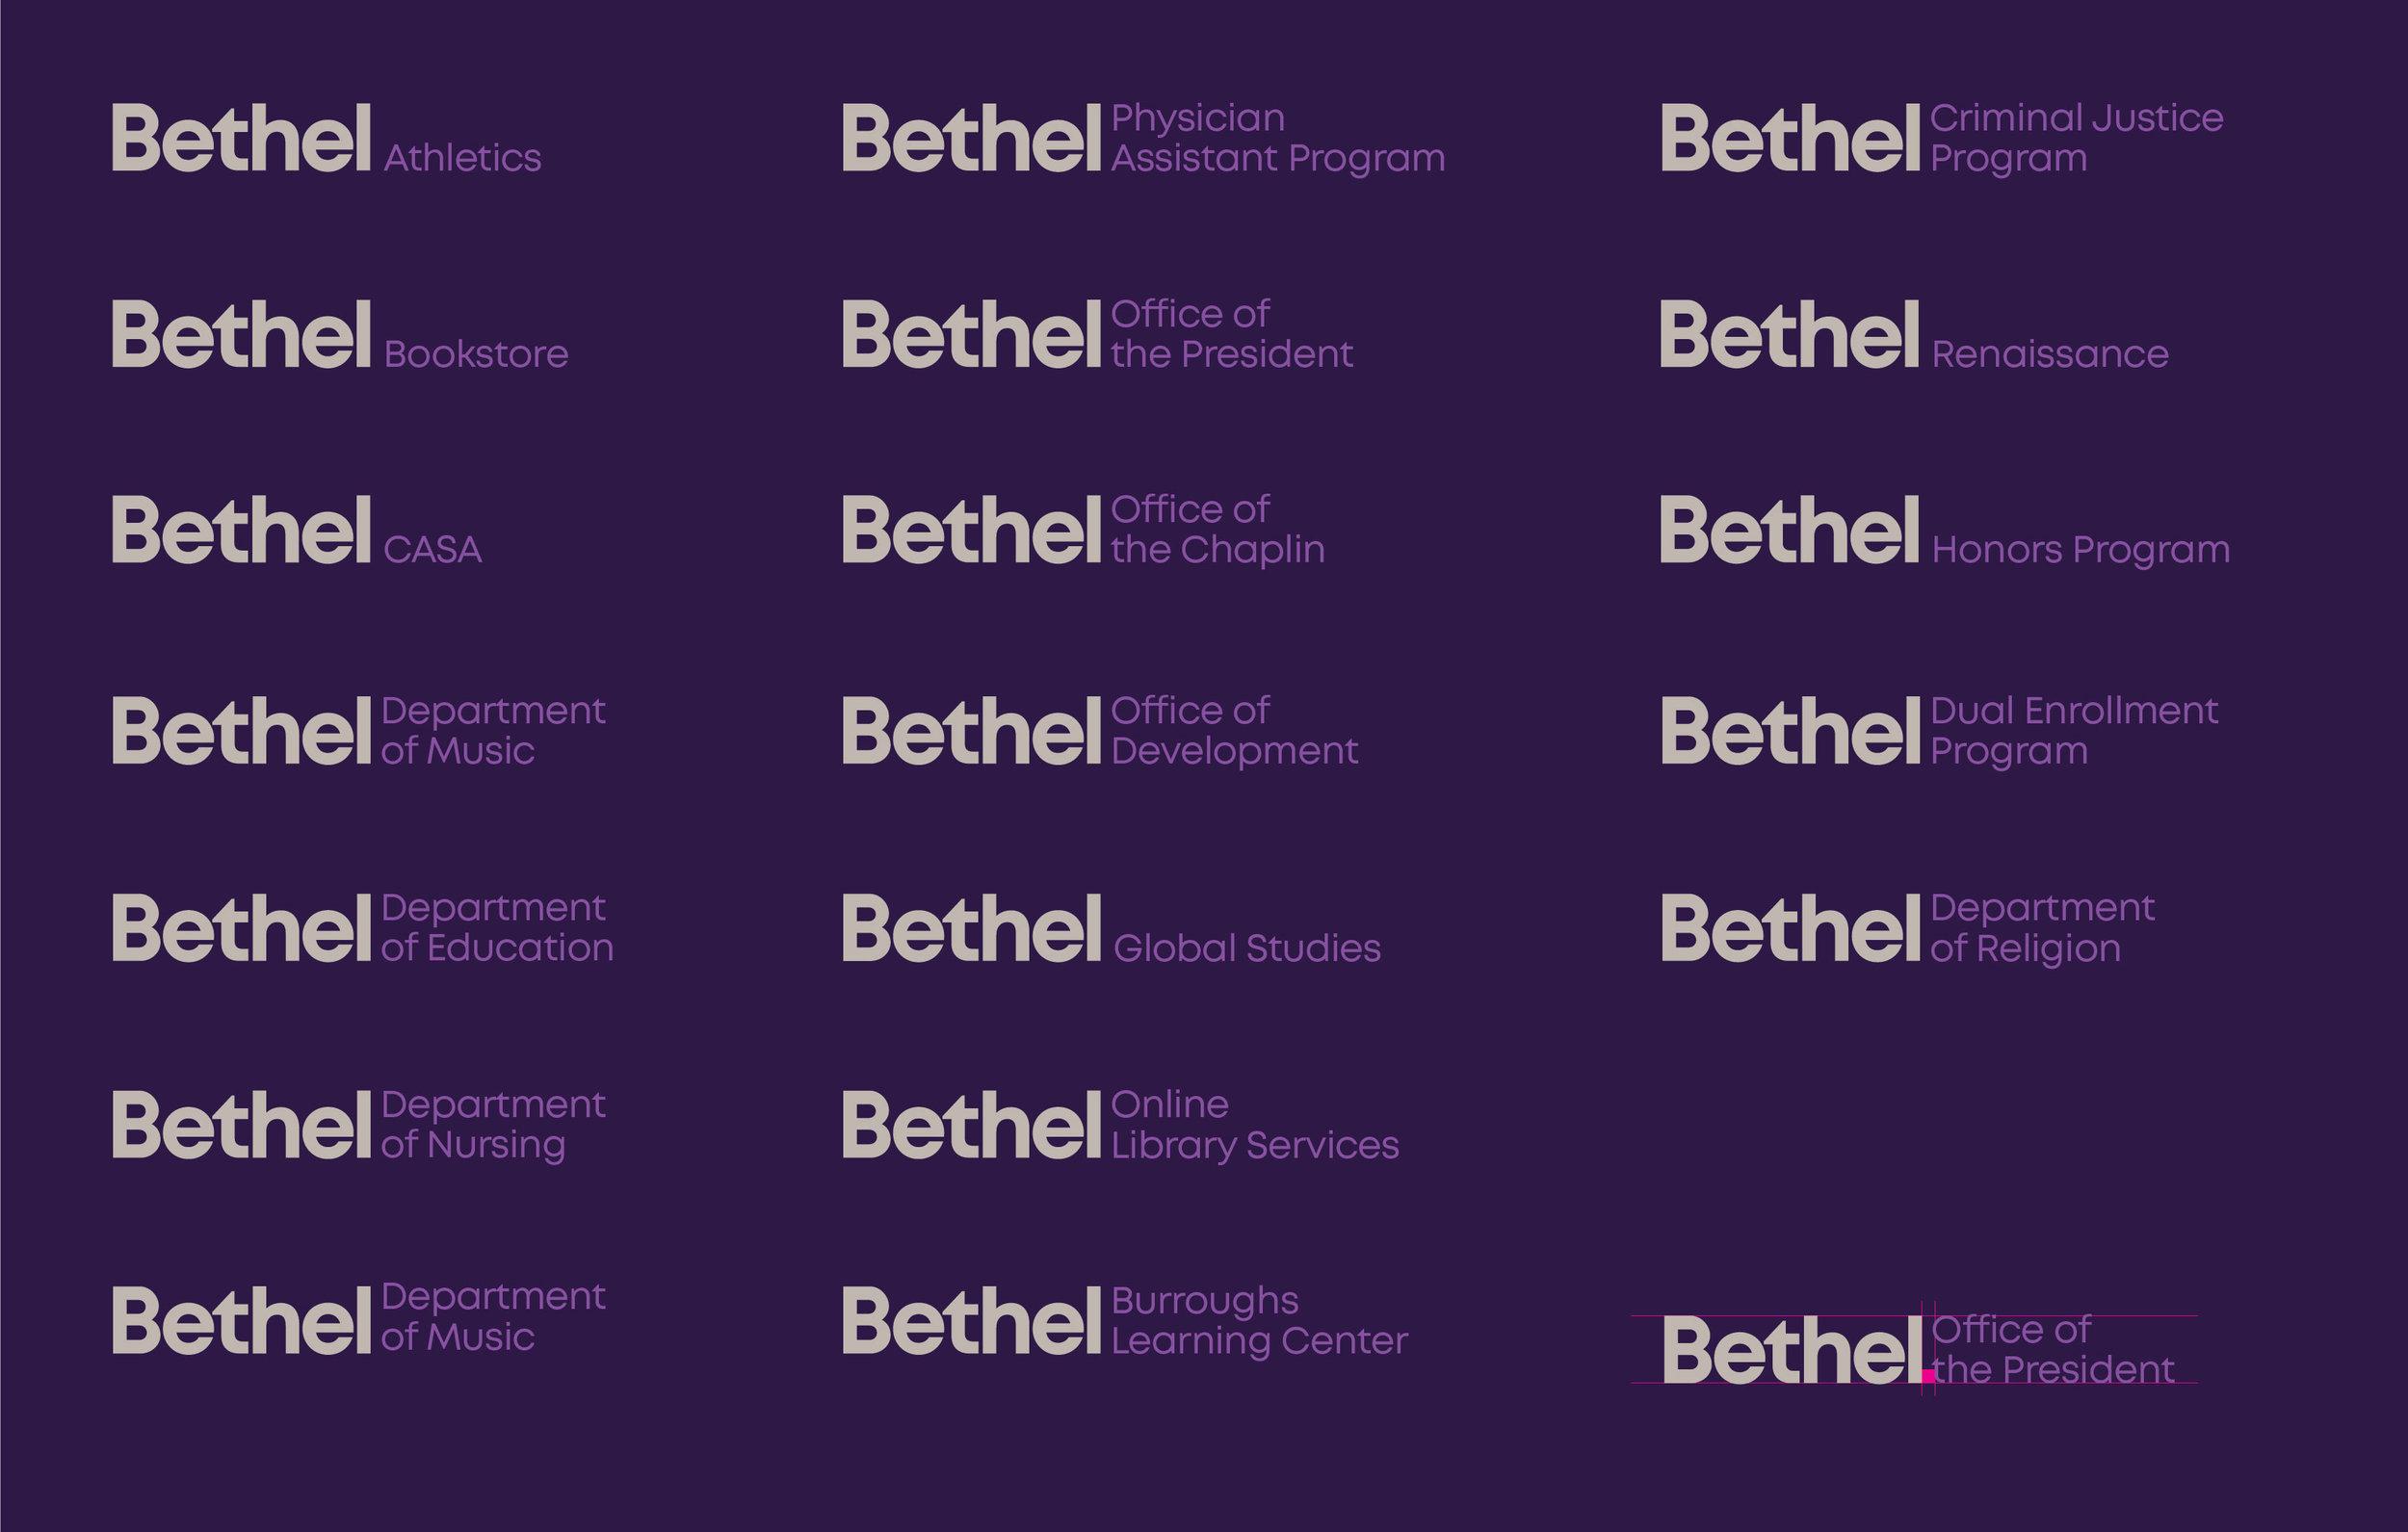 Bethel_5.jpg